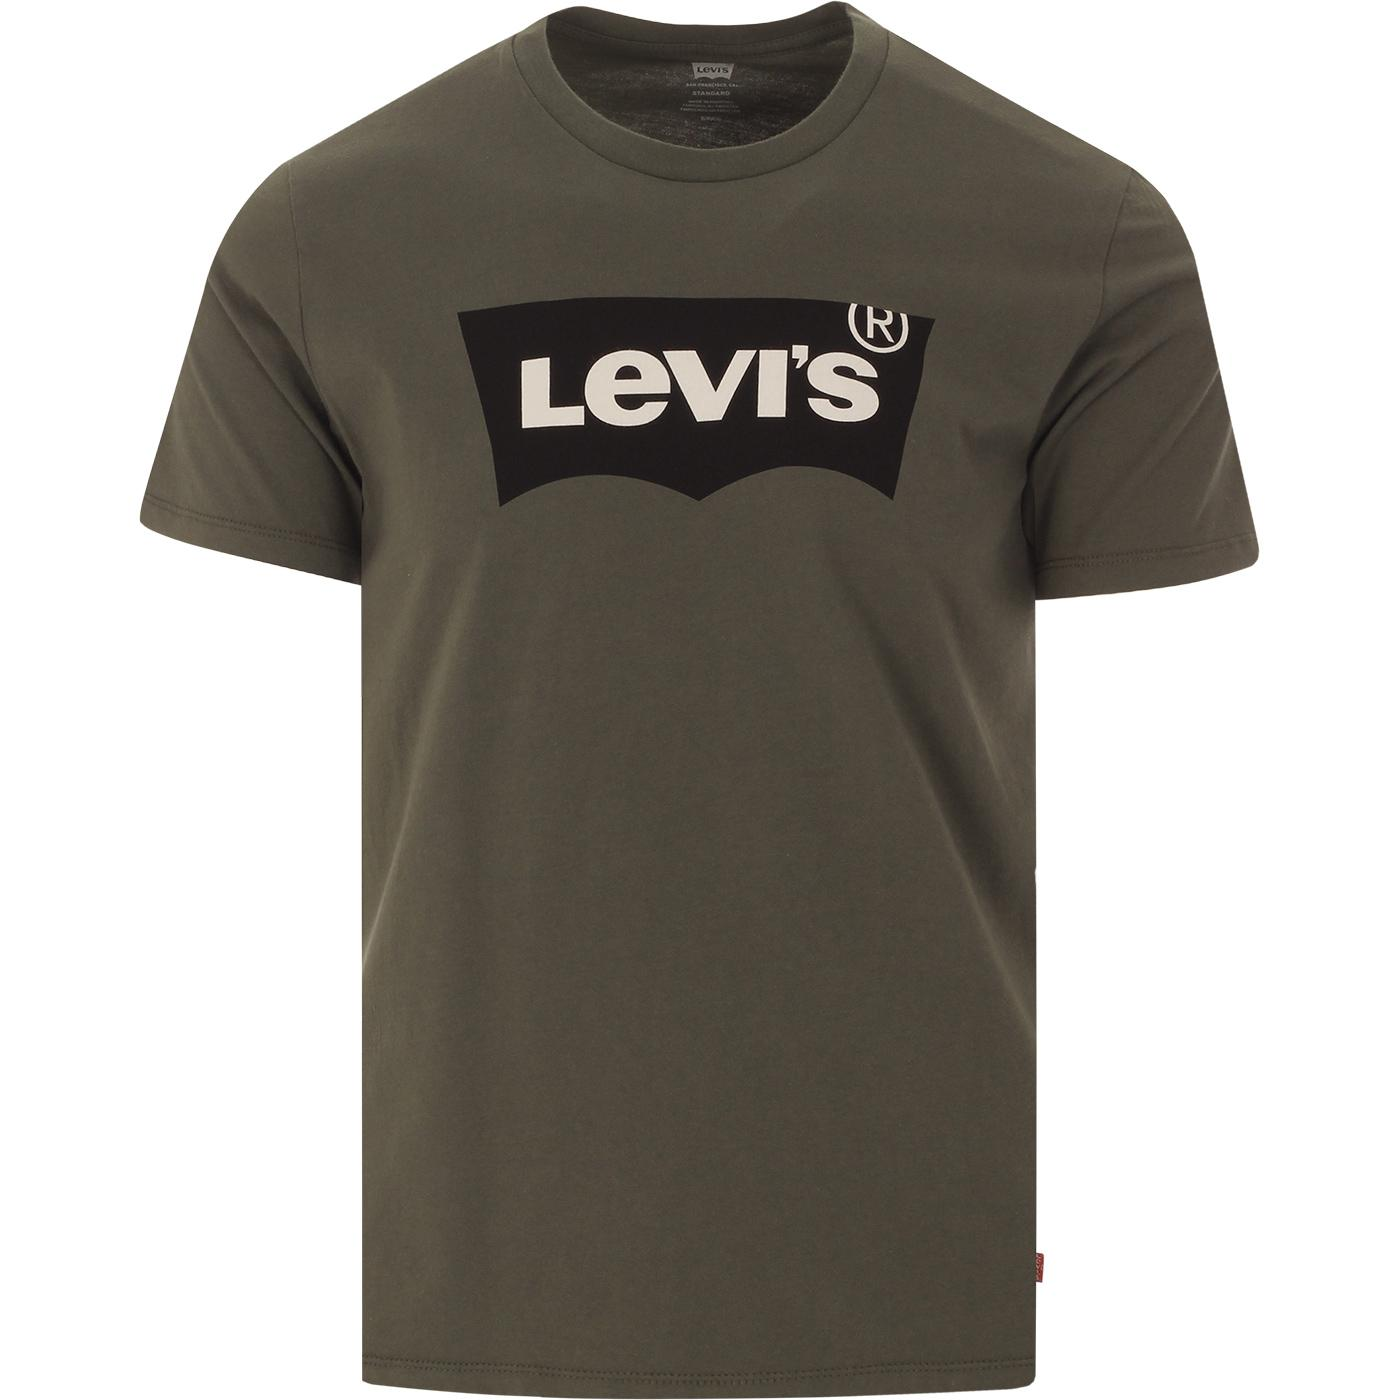 LEVI'S Men's Retro Housemark Batwing Tee (DG)